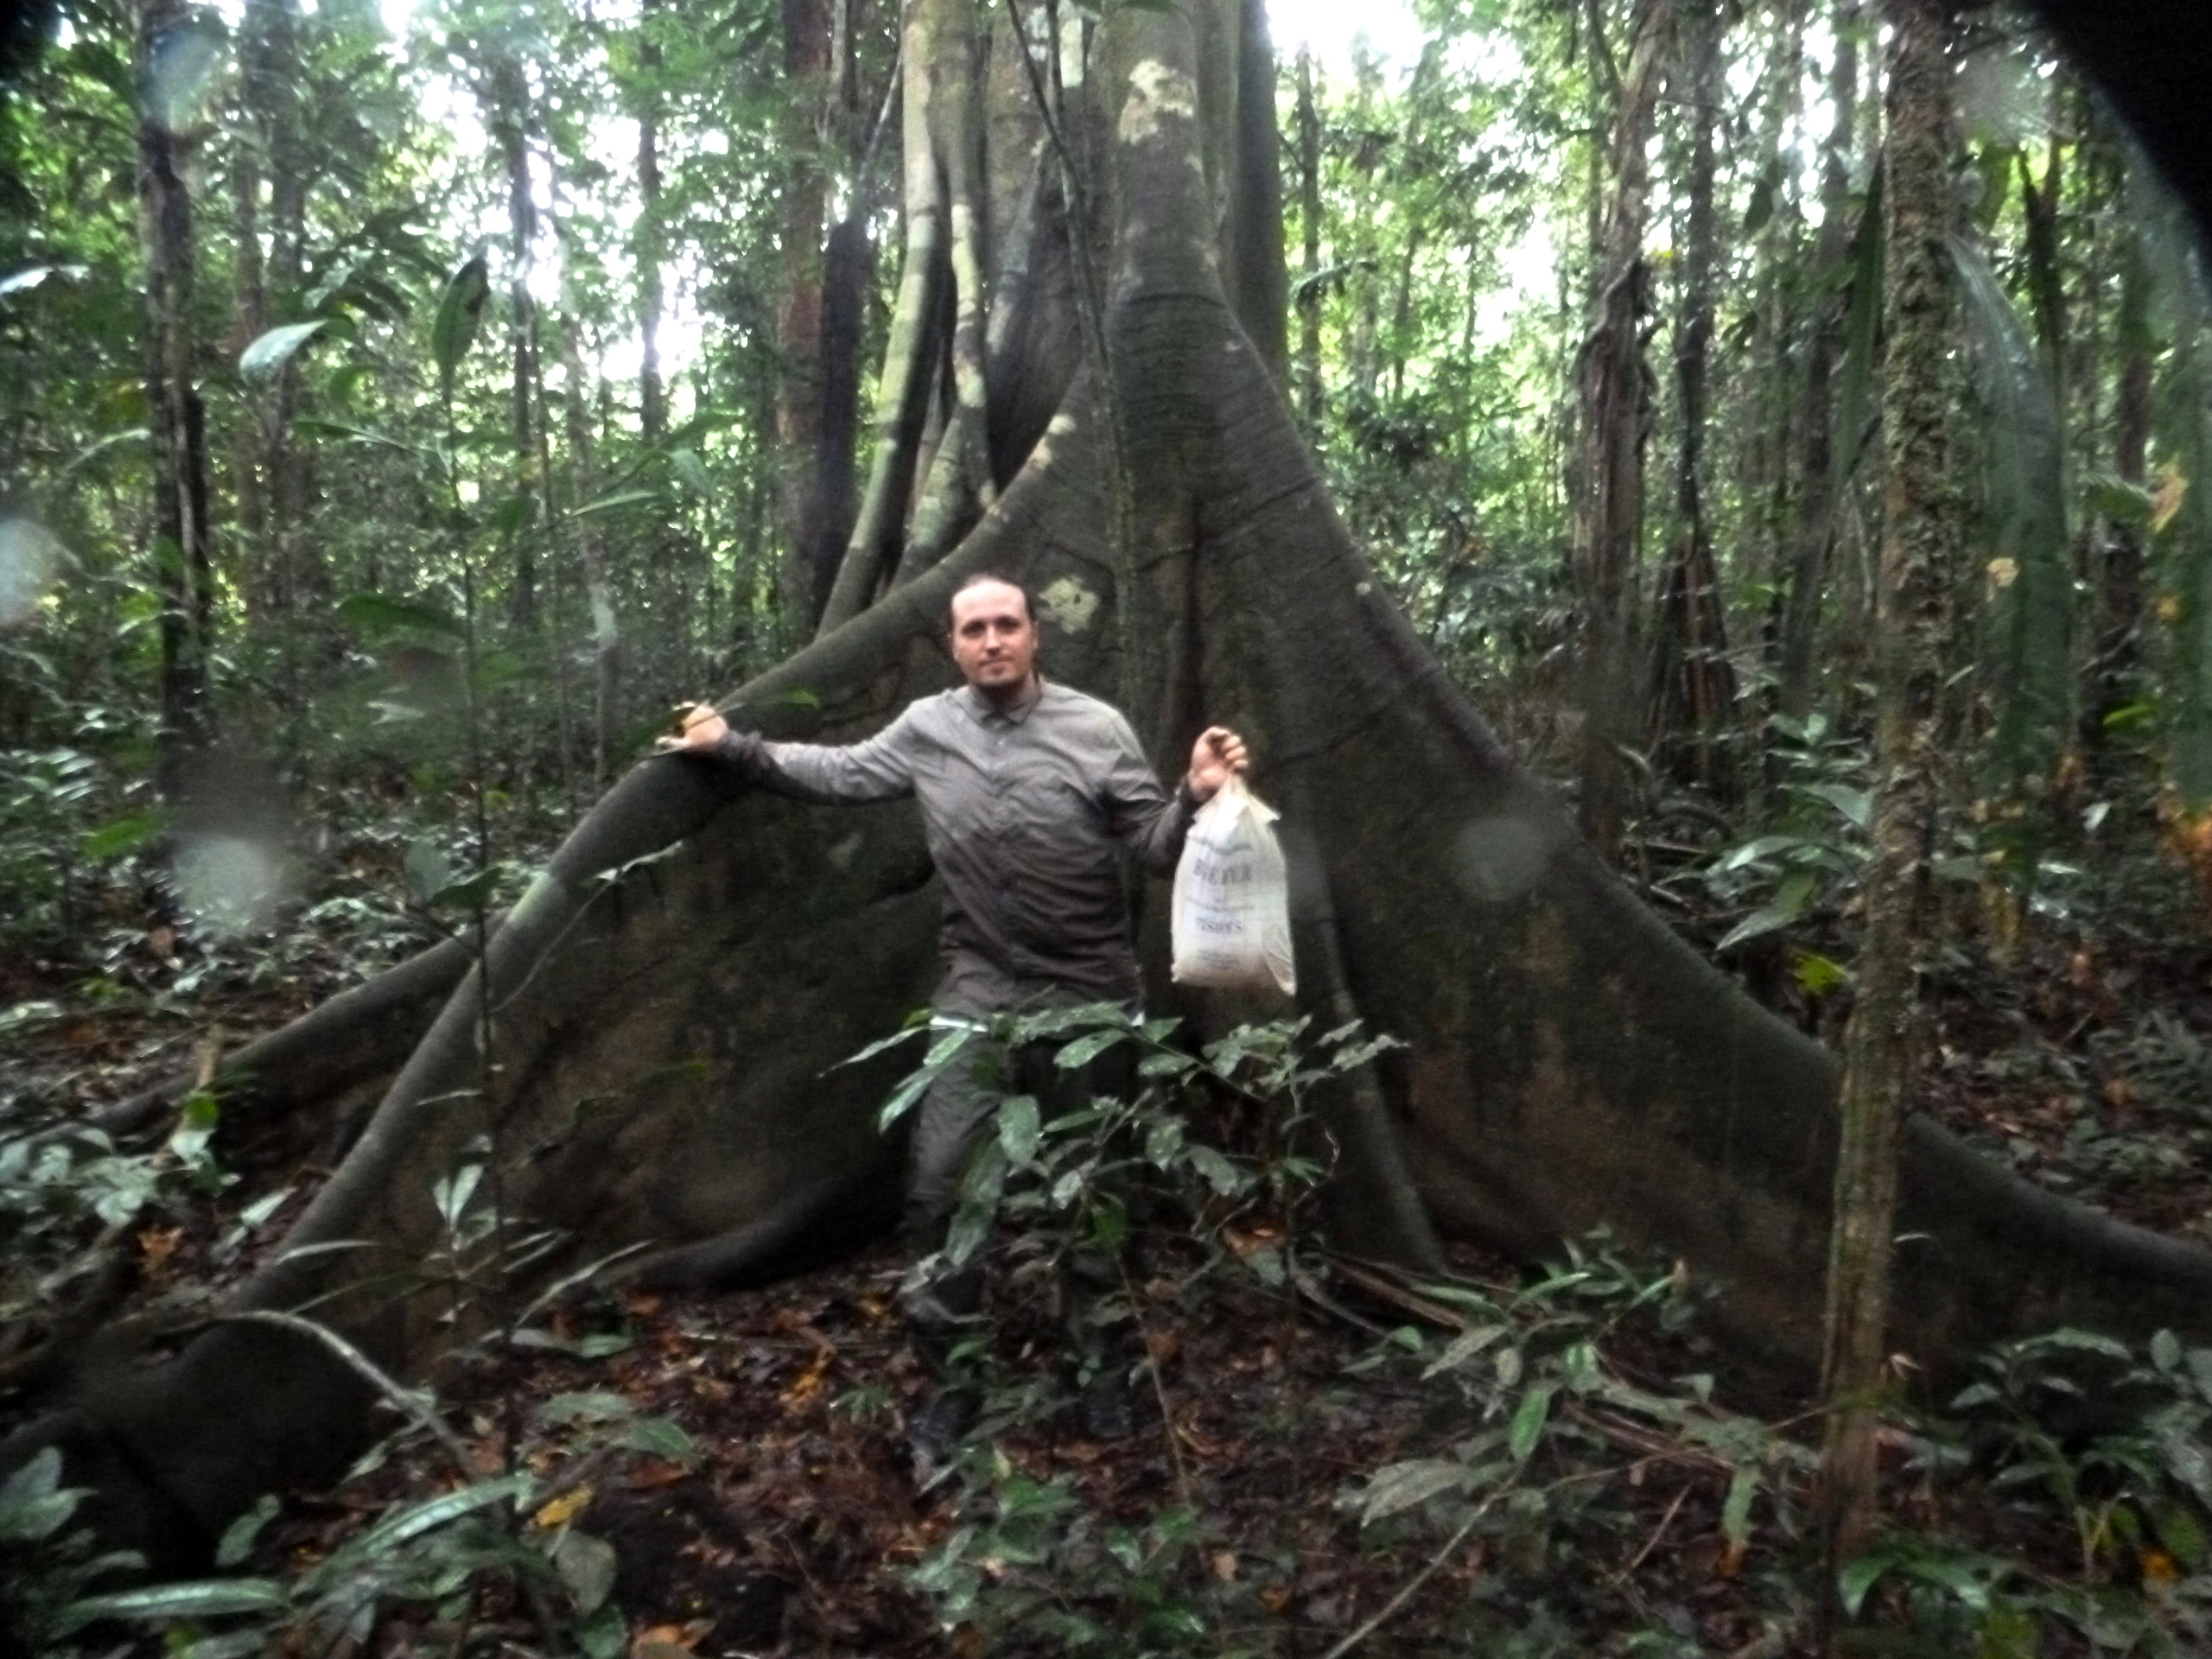 Amazonas Con heiko septiembre 2014 077